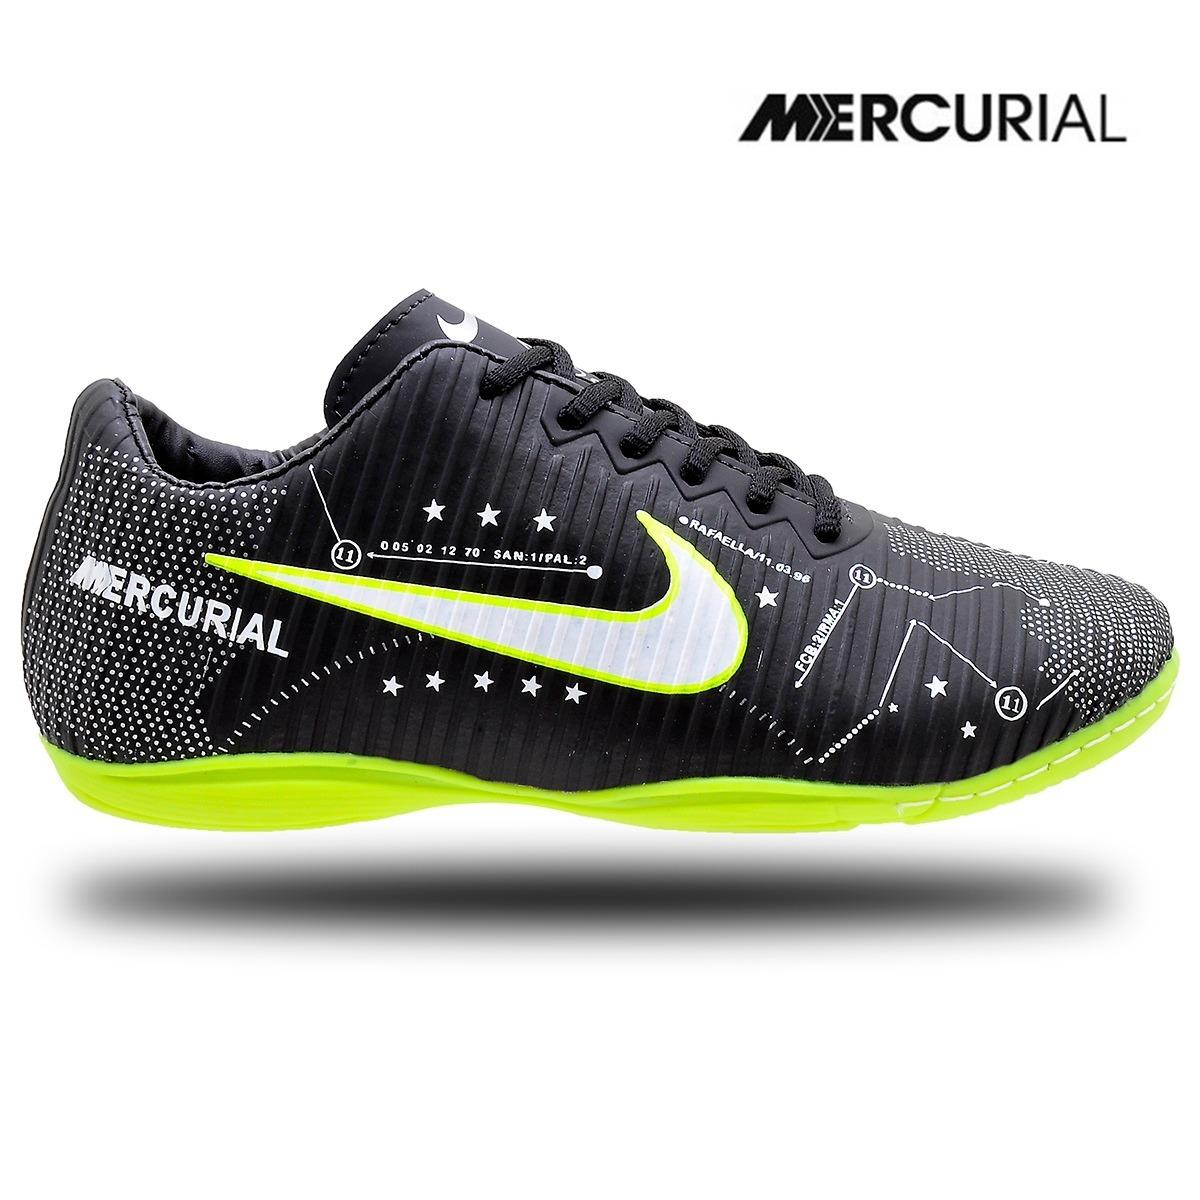 Chuteira Futsal Neymar Adulto 27 Ao 43 Para Quadra - R  89 41dc8416cfd96